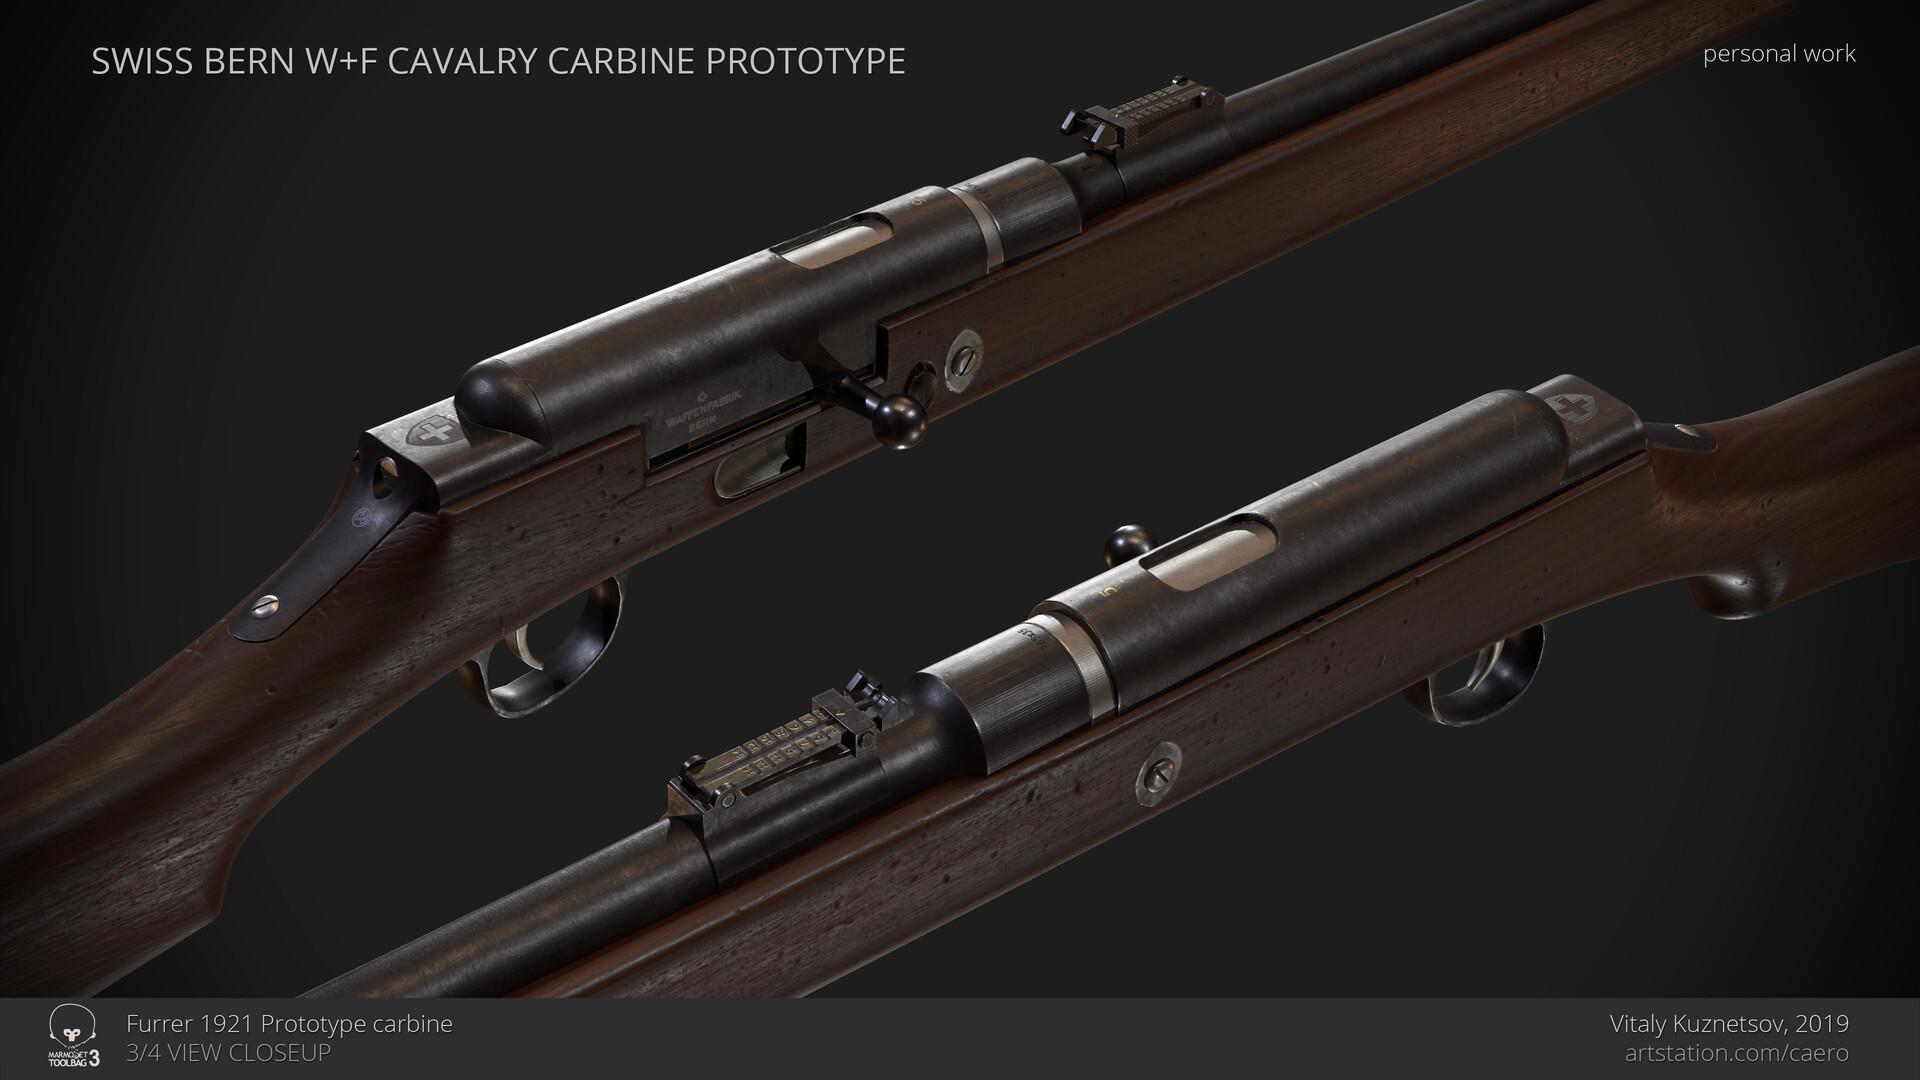 ArtStation - Bern Prototype cavalry carbine, Vitaly Kuznetsov